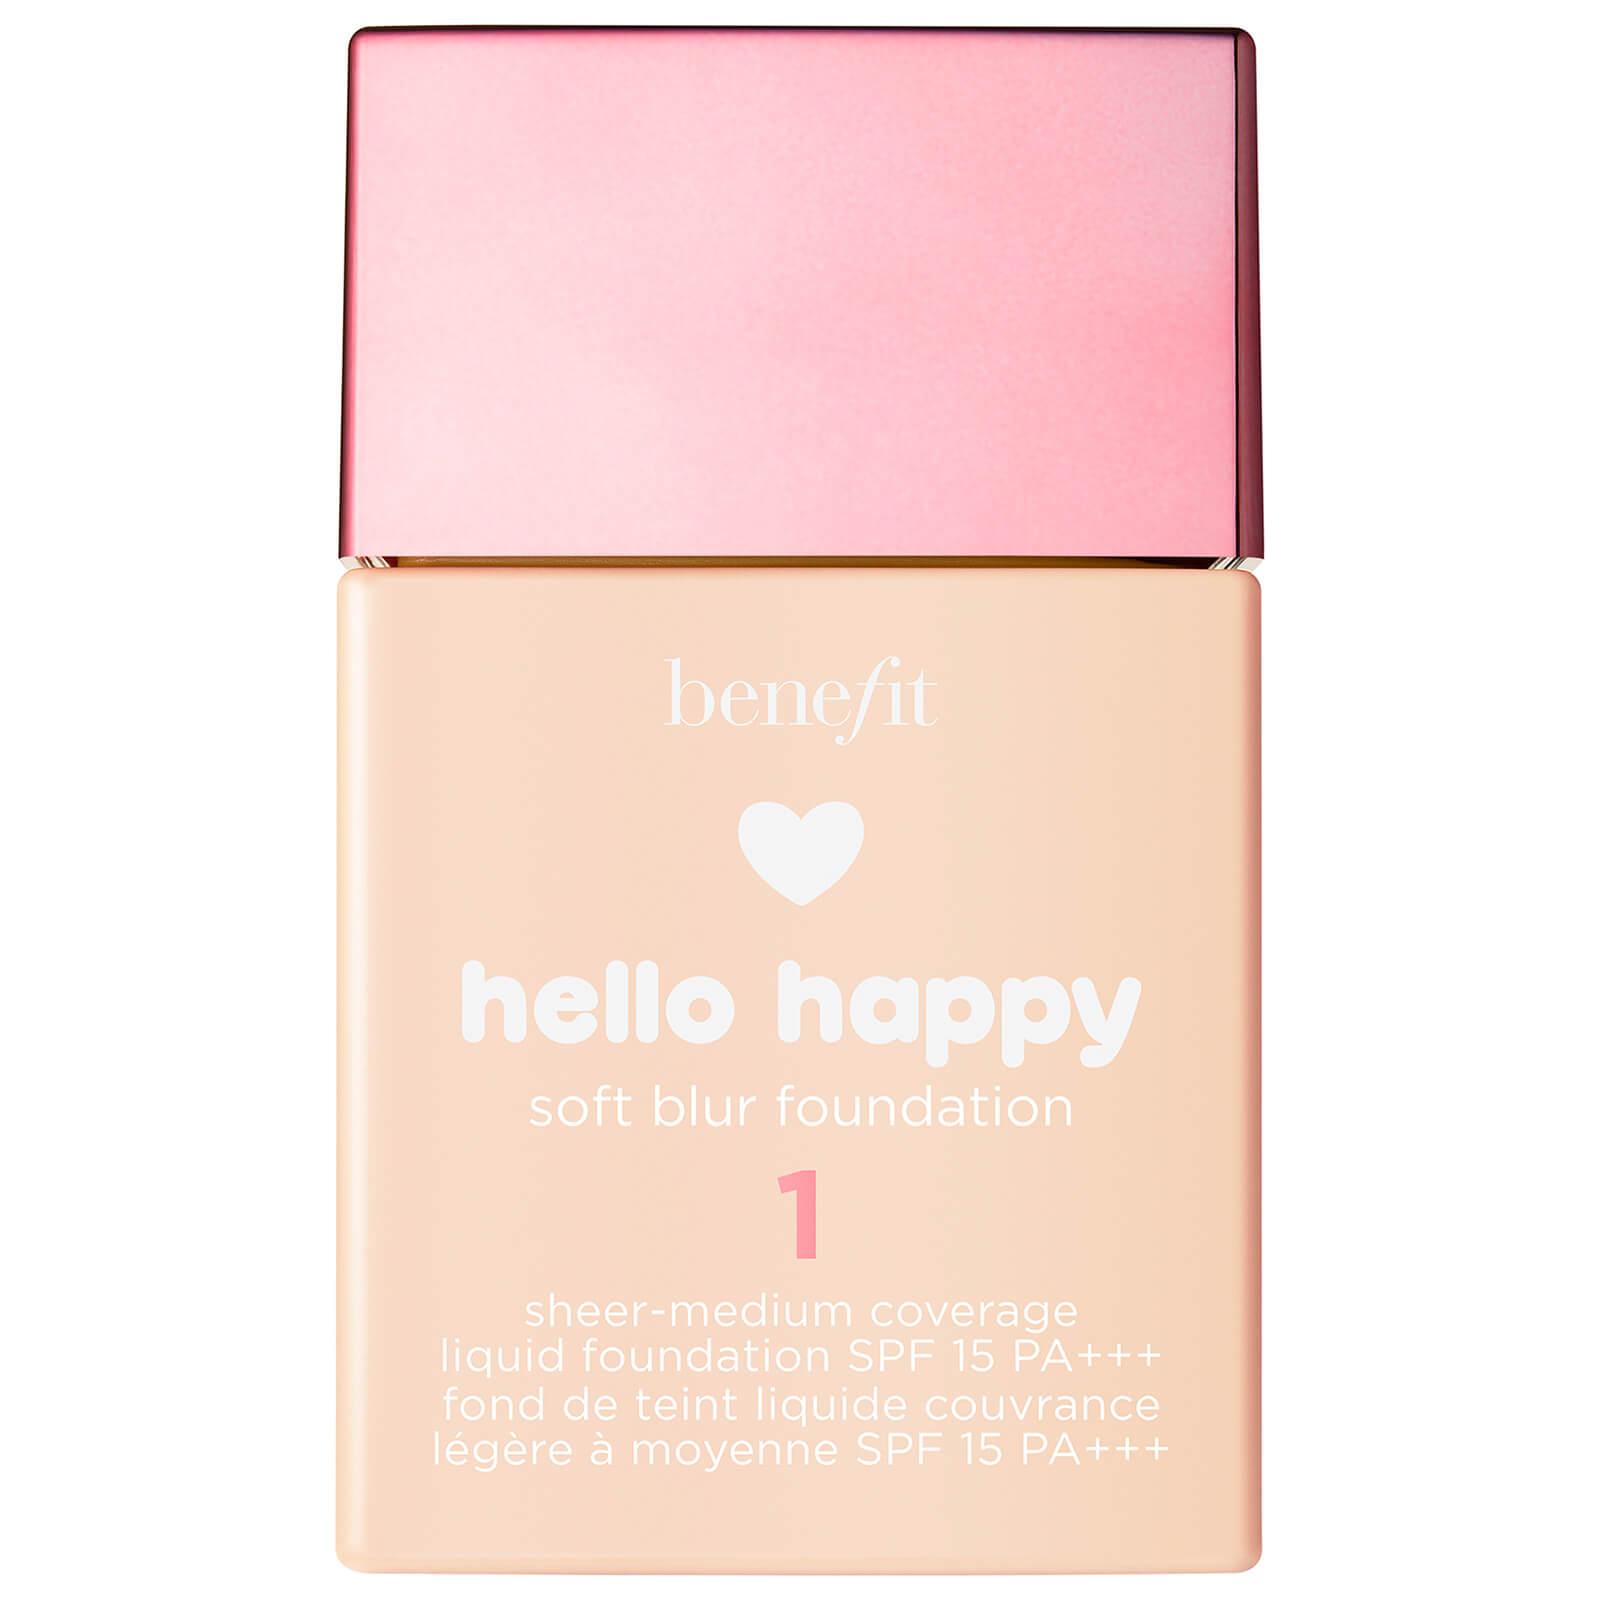 Benefit Hello Happy Soft Blur Foundation (Various Shades) - 1